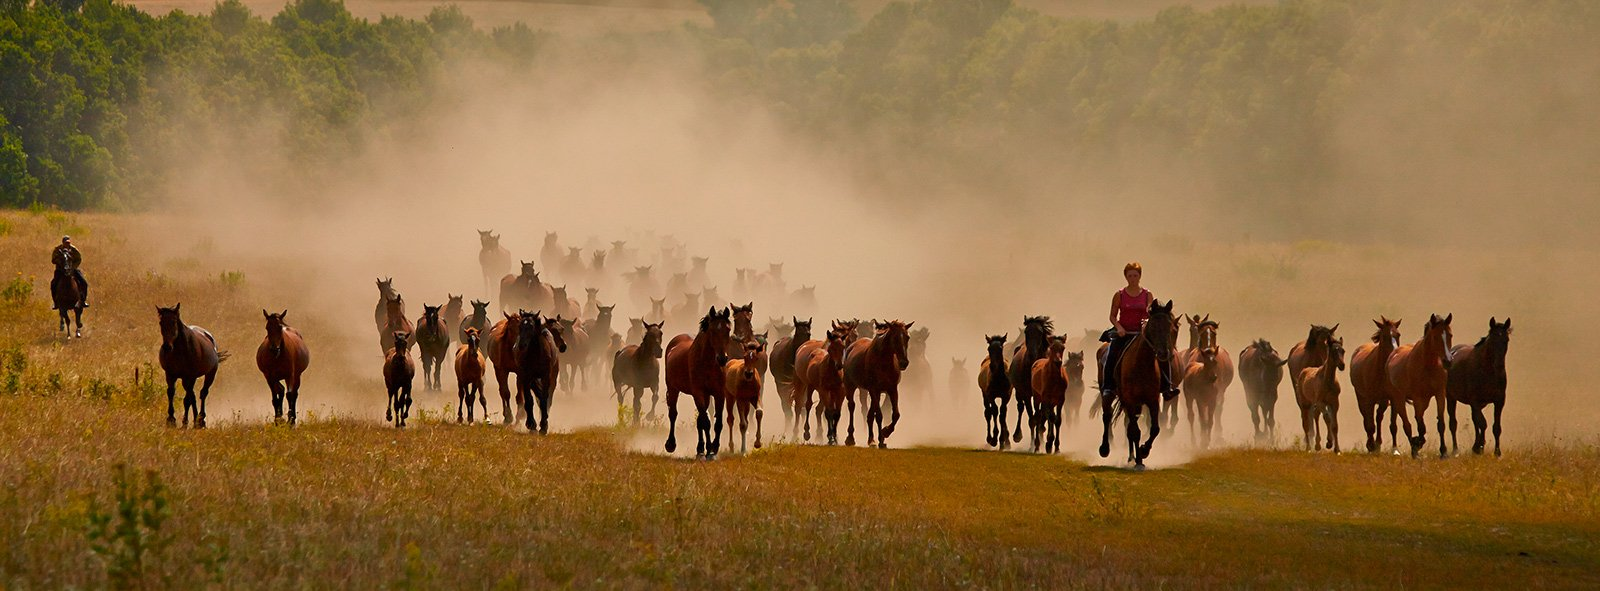 кони,лошади,пыль,табун, Fotojazz